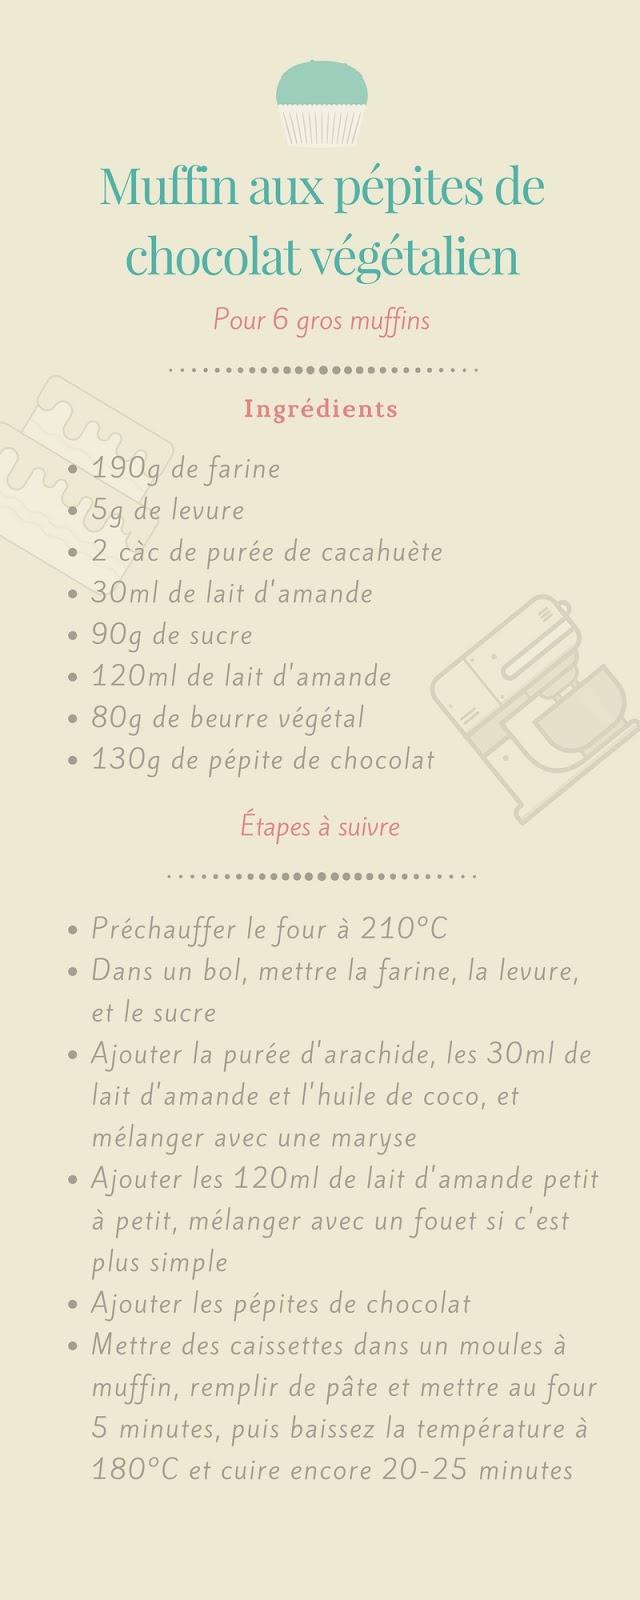 http://www.watercolorcake.fr/2018/03/muffin-pepites-de-chocolat-vegan.html